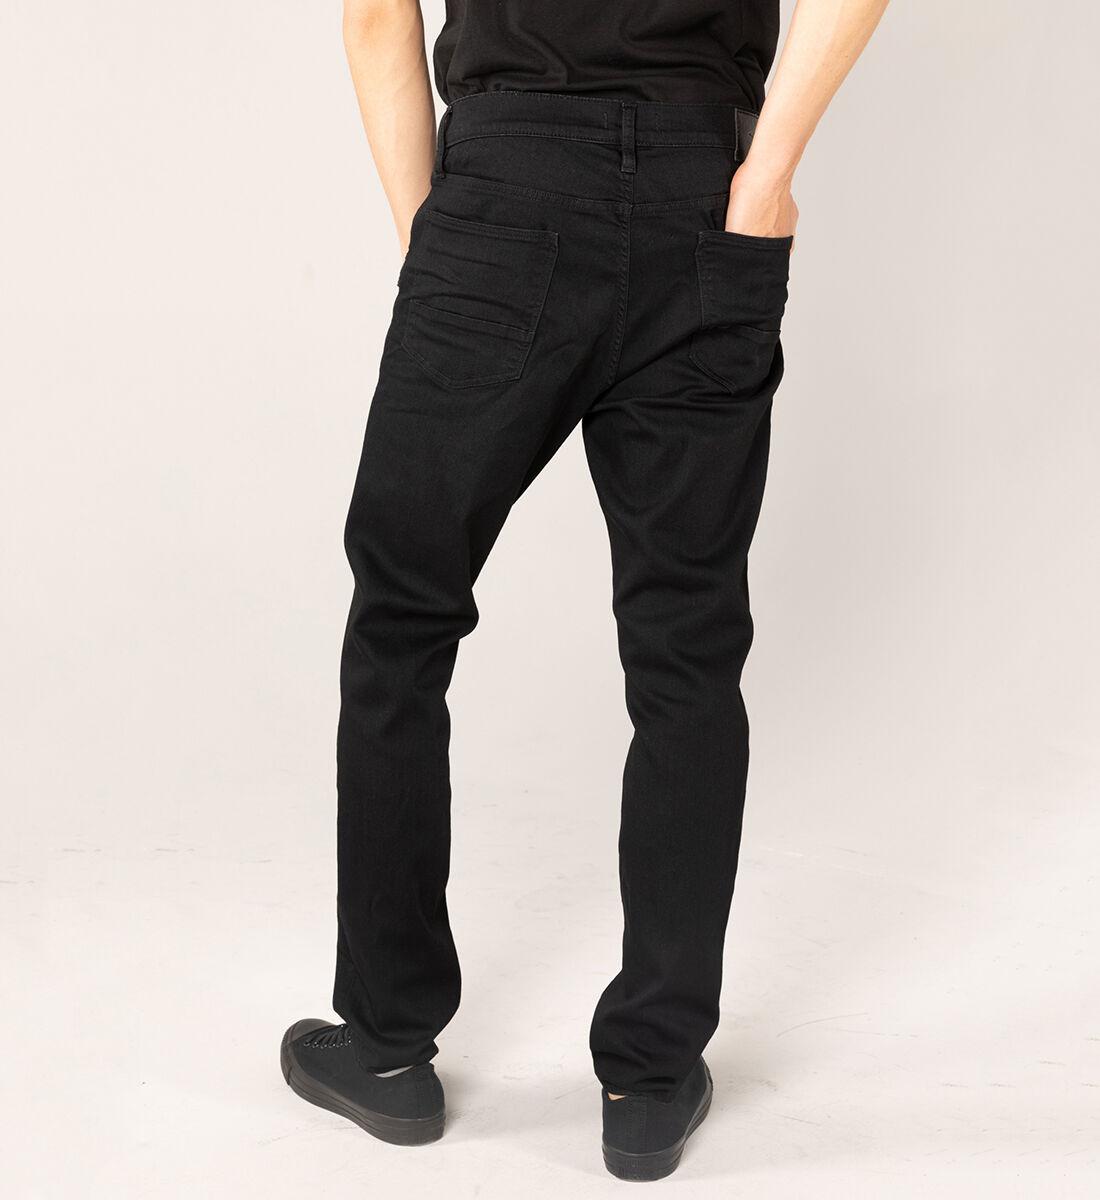 Kenaston  Slim Fit Slim Leg Jeans Back